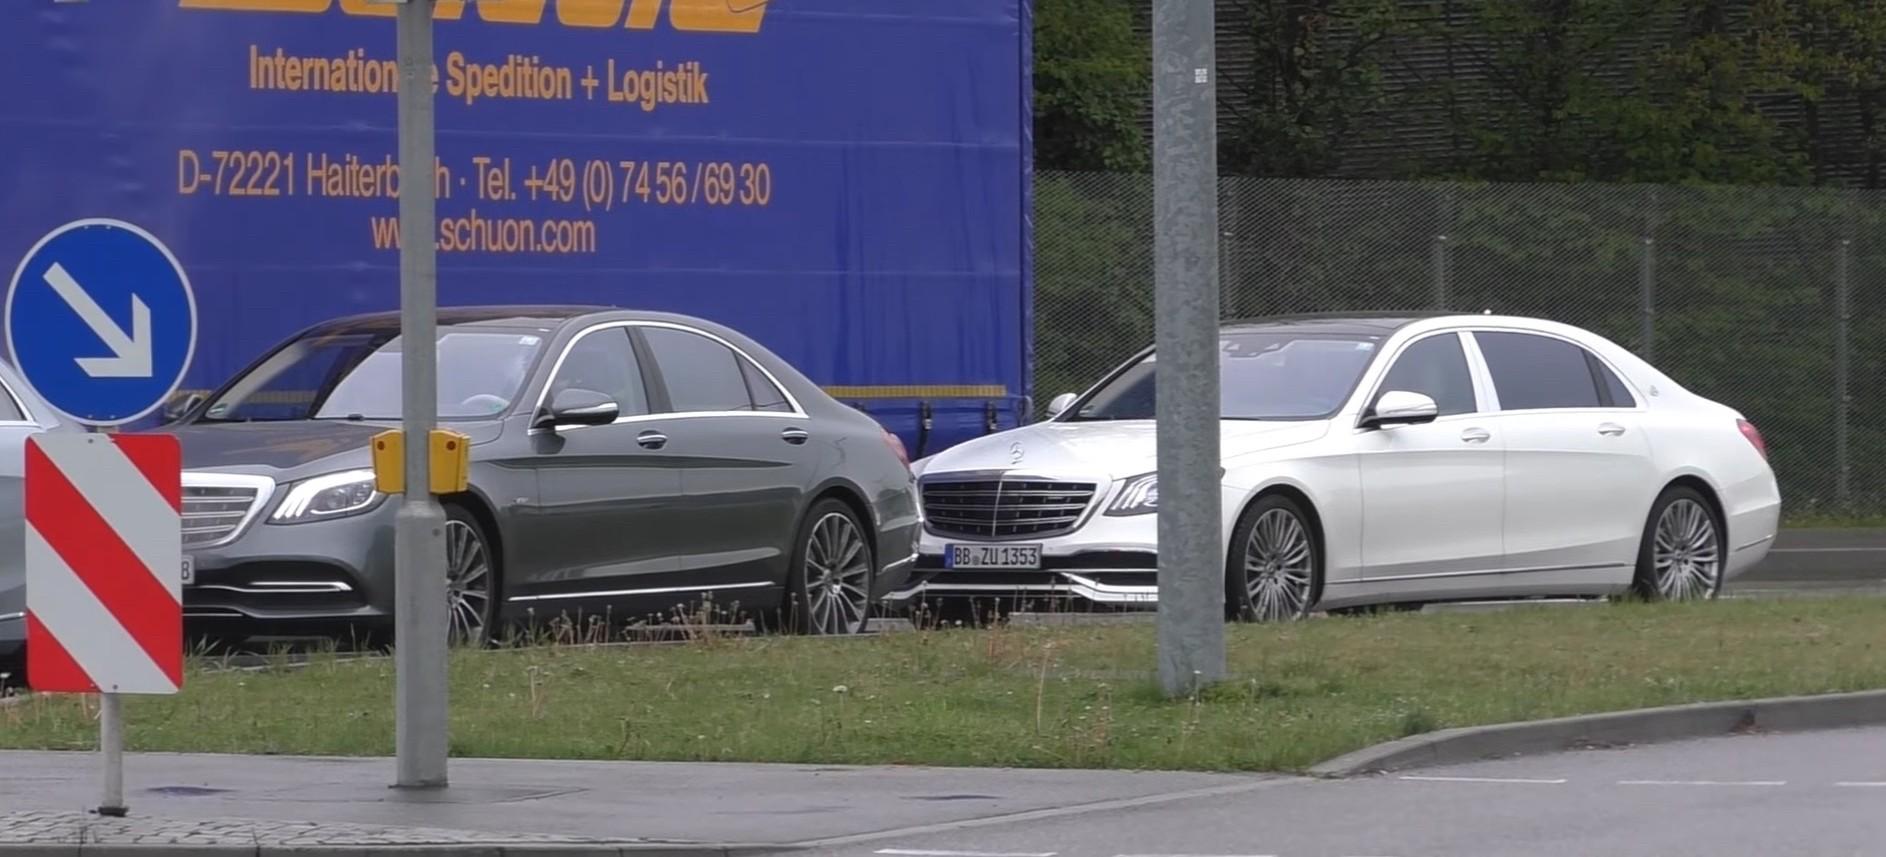 https://s1.cdn.autoevolution.com/images/news/gallery/mercedes-erlknig-s-klasse-s-class-maybach-facelift-convoy-w222-ungetarnt-undi_5.jpg